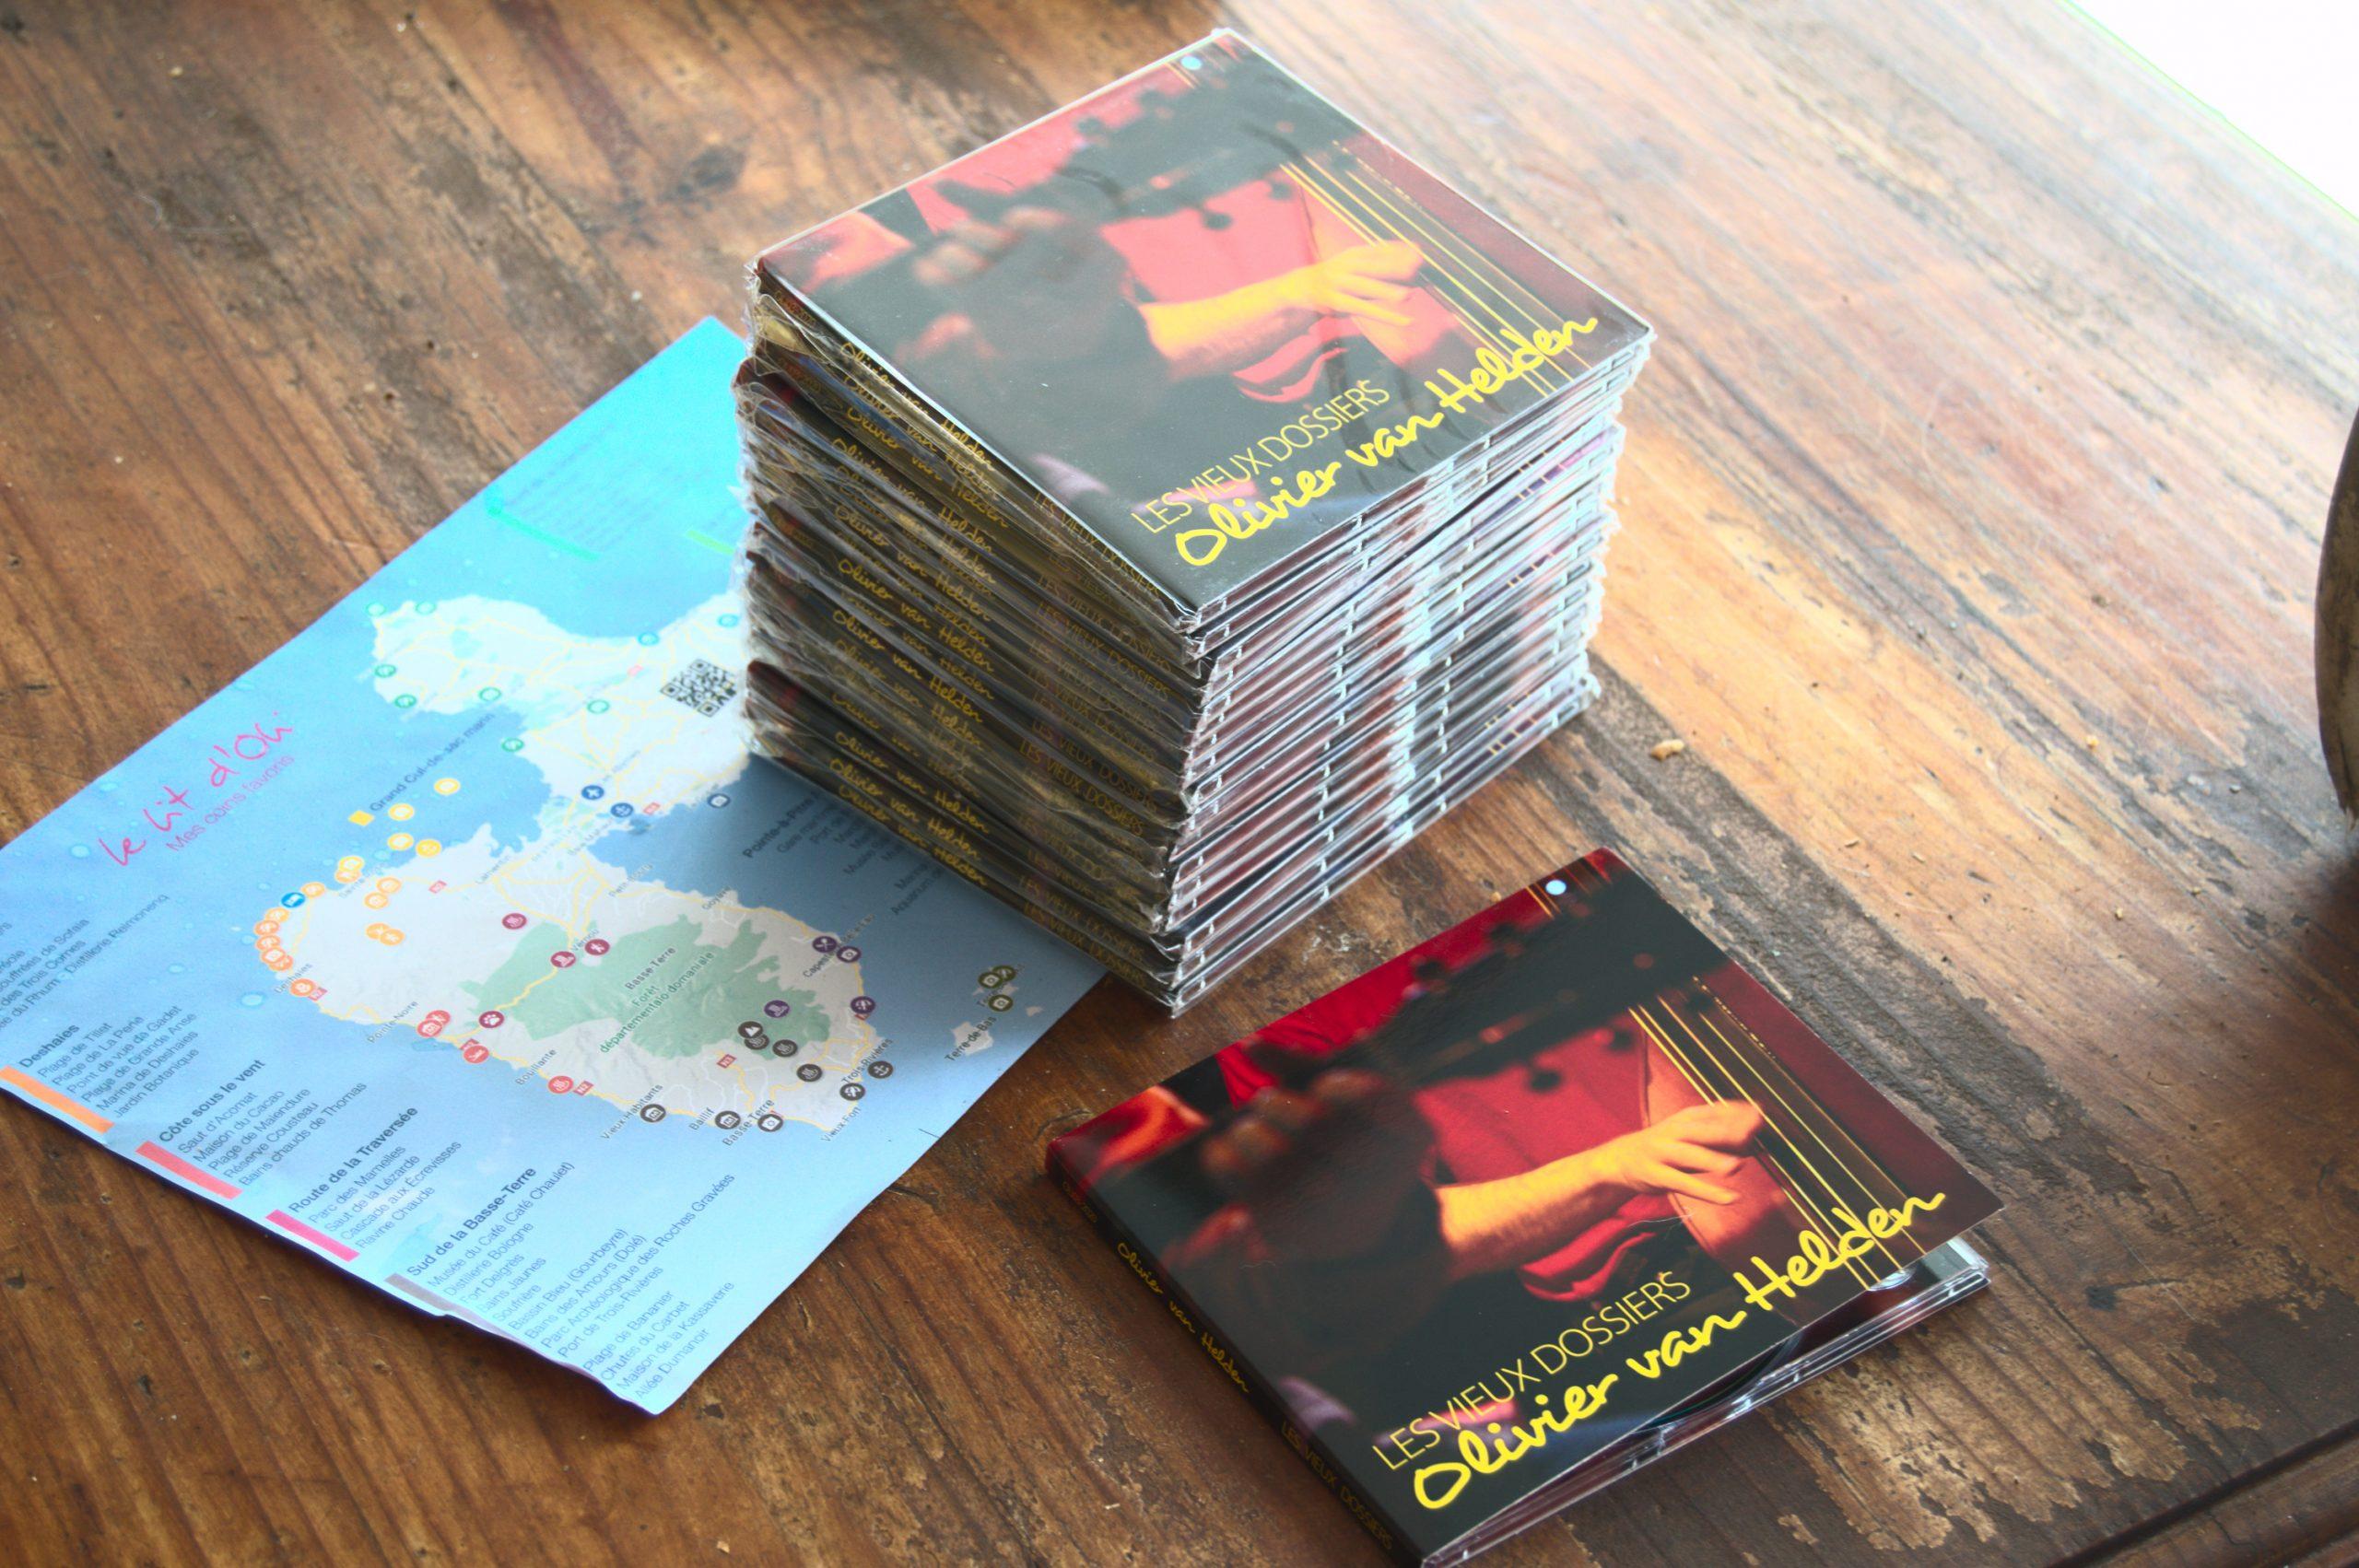 Presque plus de CD…